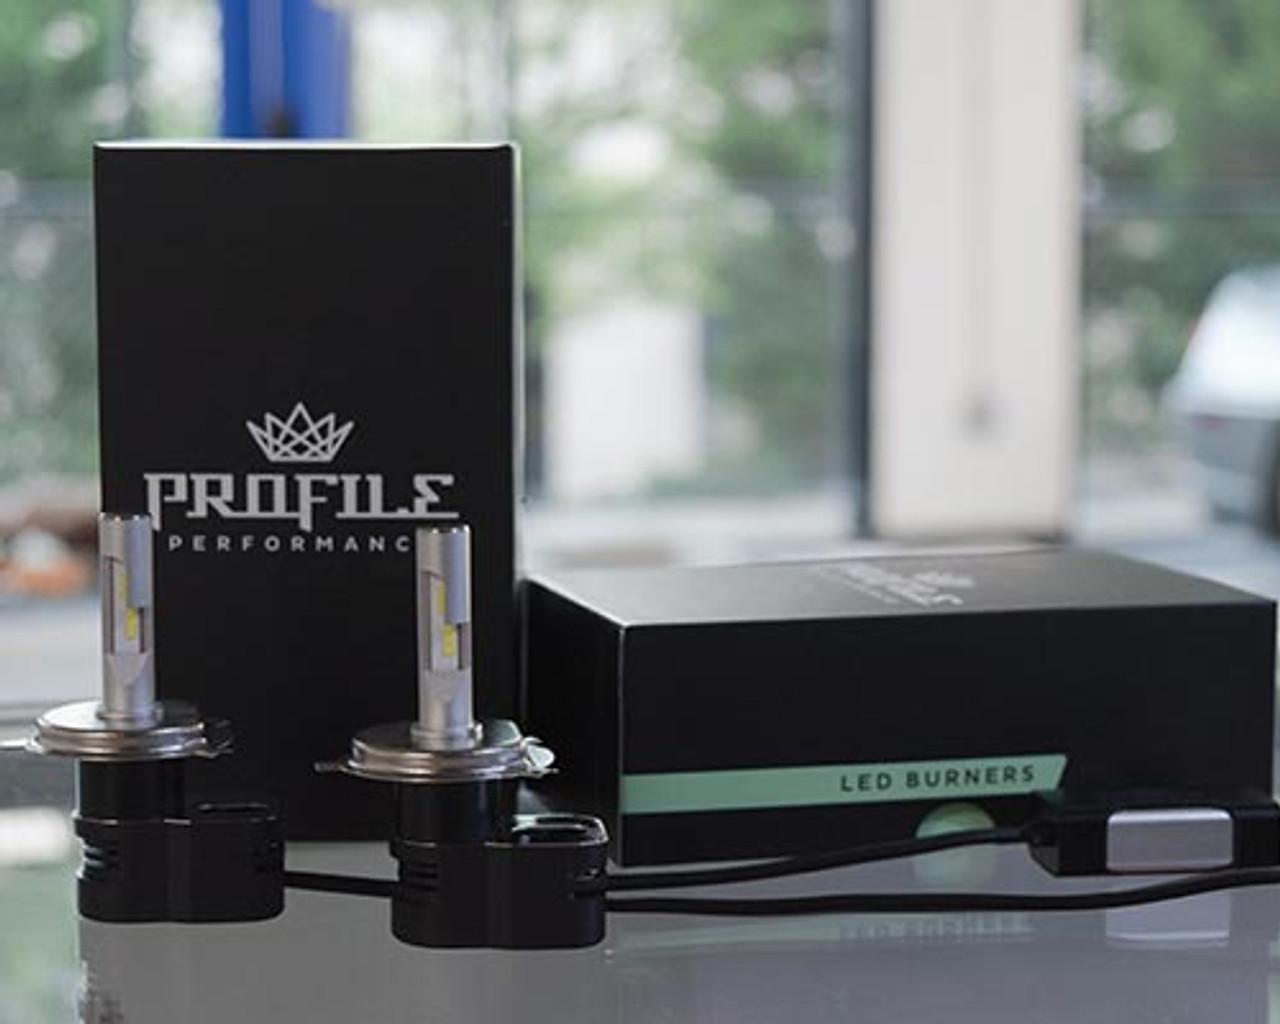 H4/9003 - Profile Peak LED Bulb kit (hi/low beam)